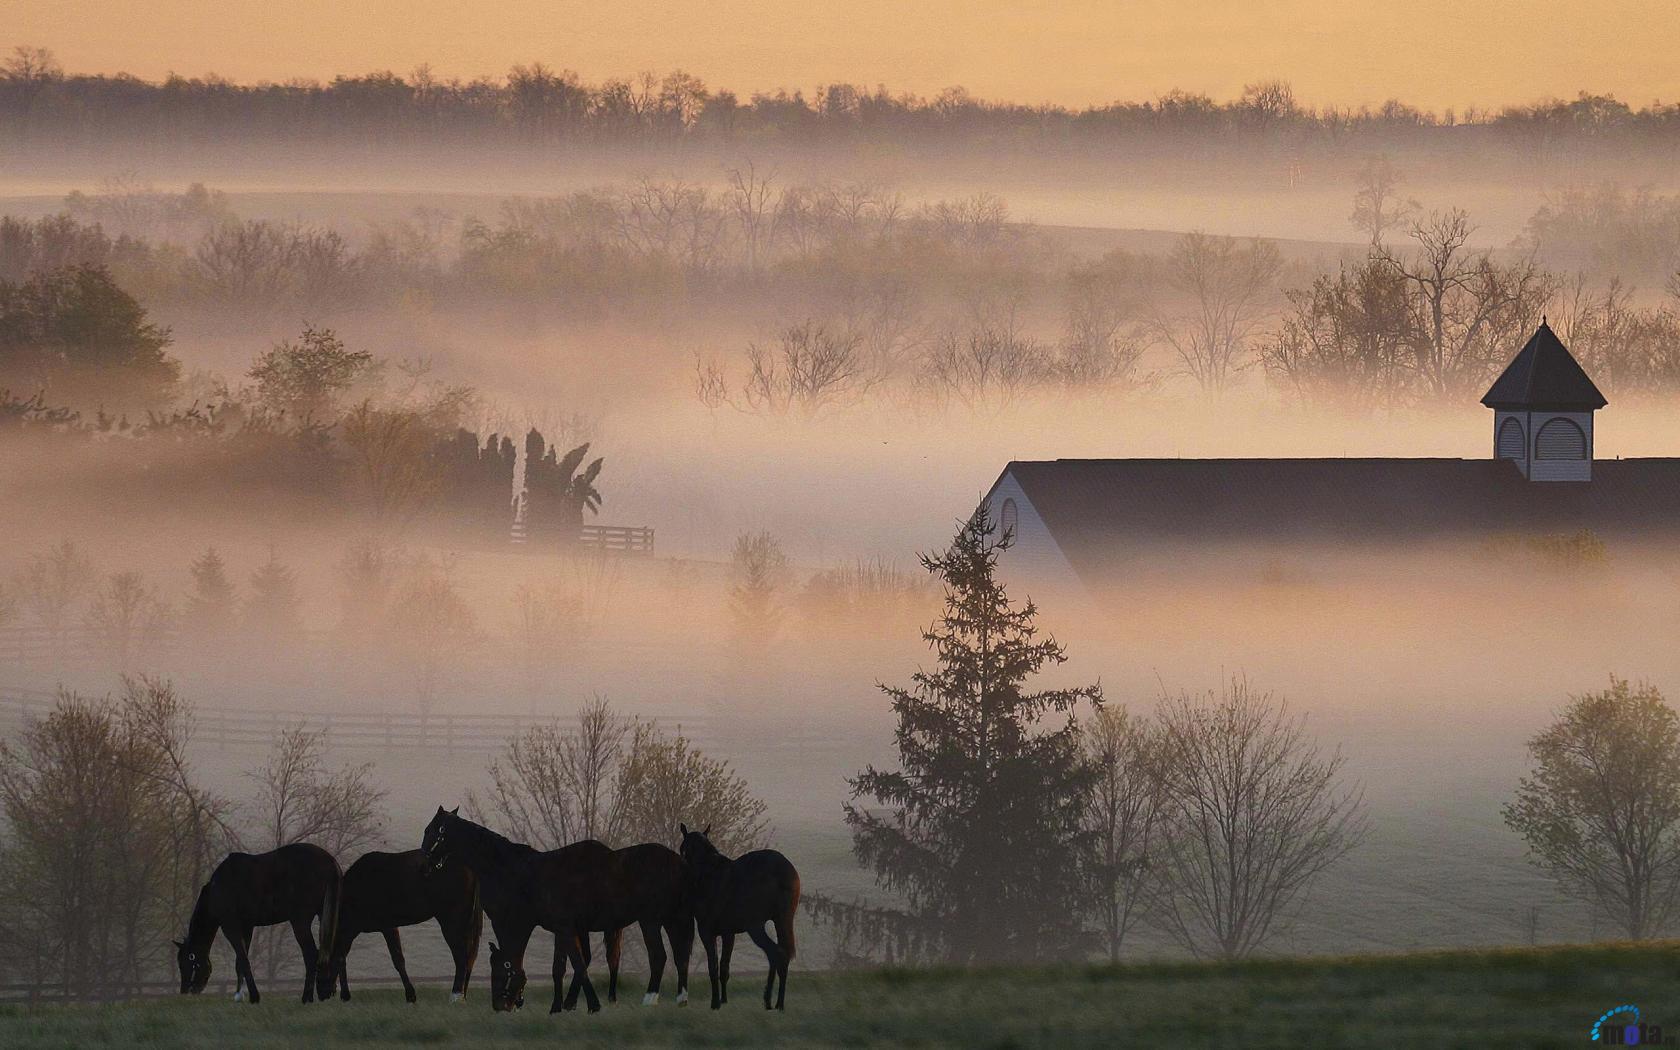 Download Wallpaper Early morning fog on a Kentucky horse farm 1680 x 1680x1050